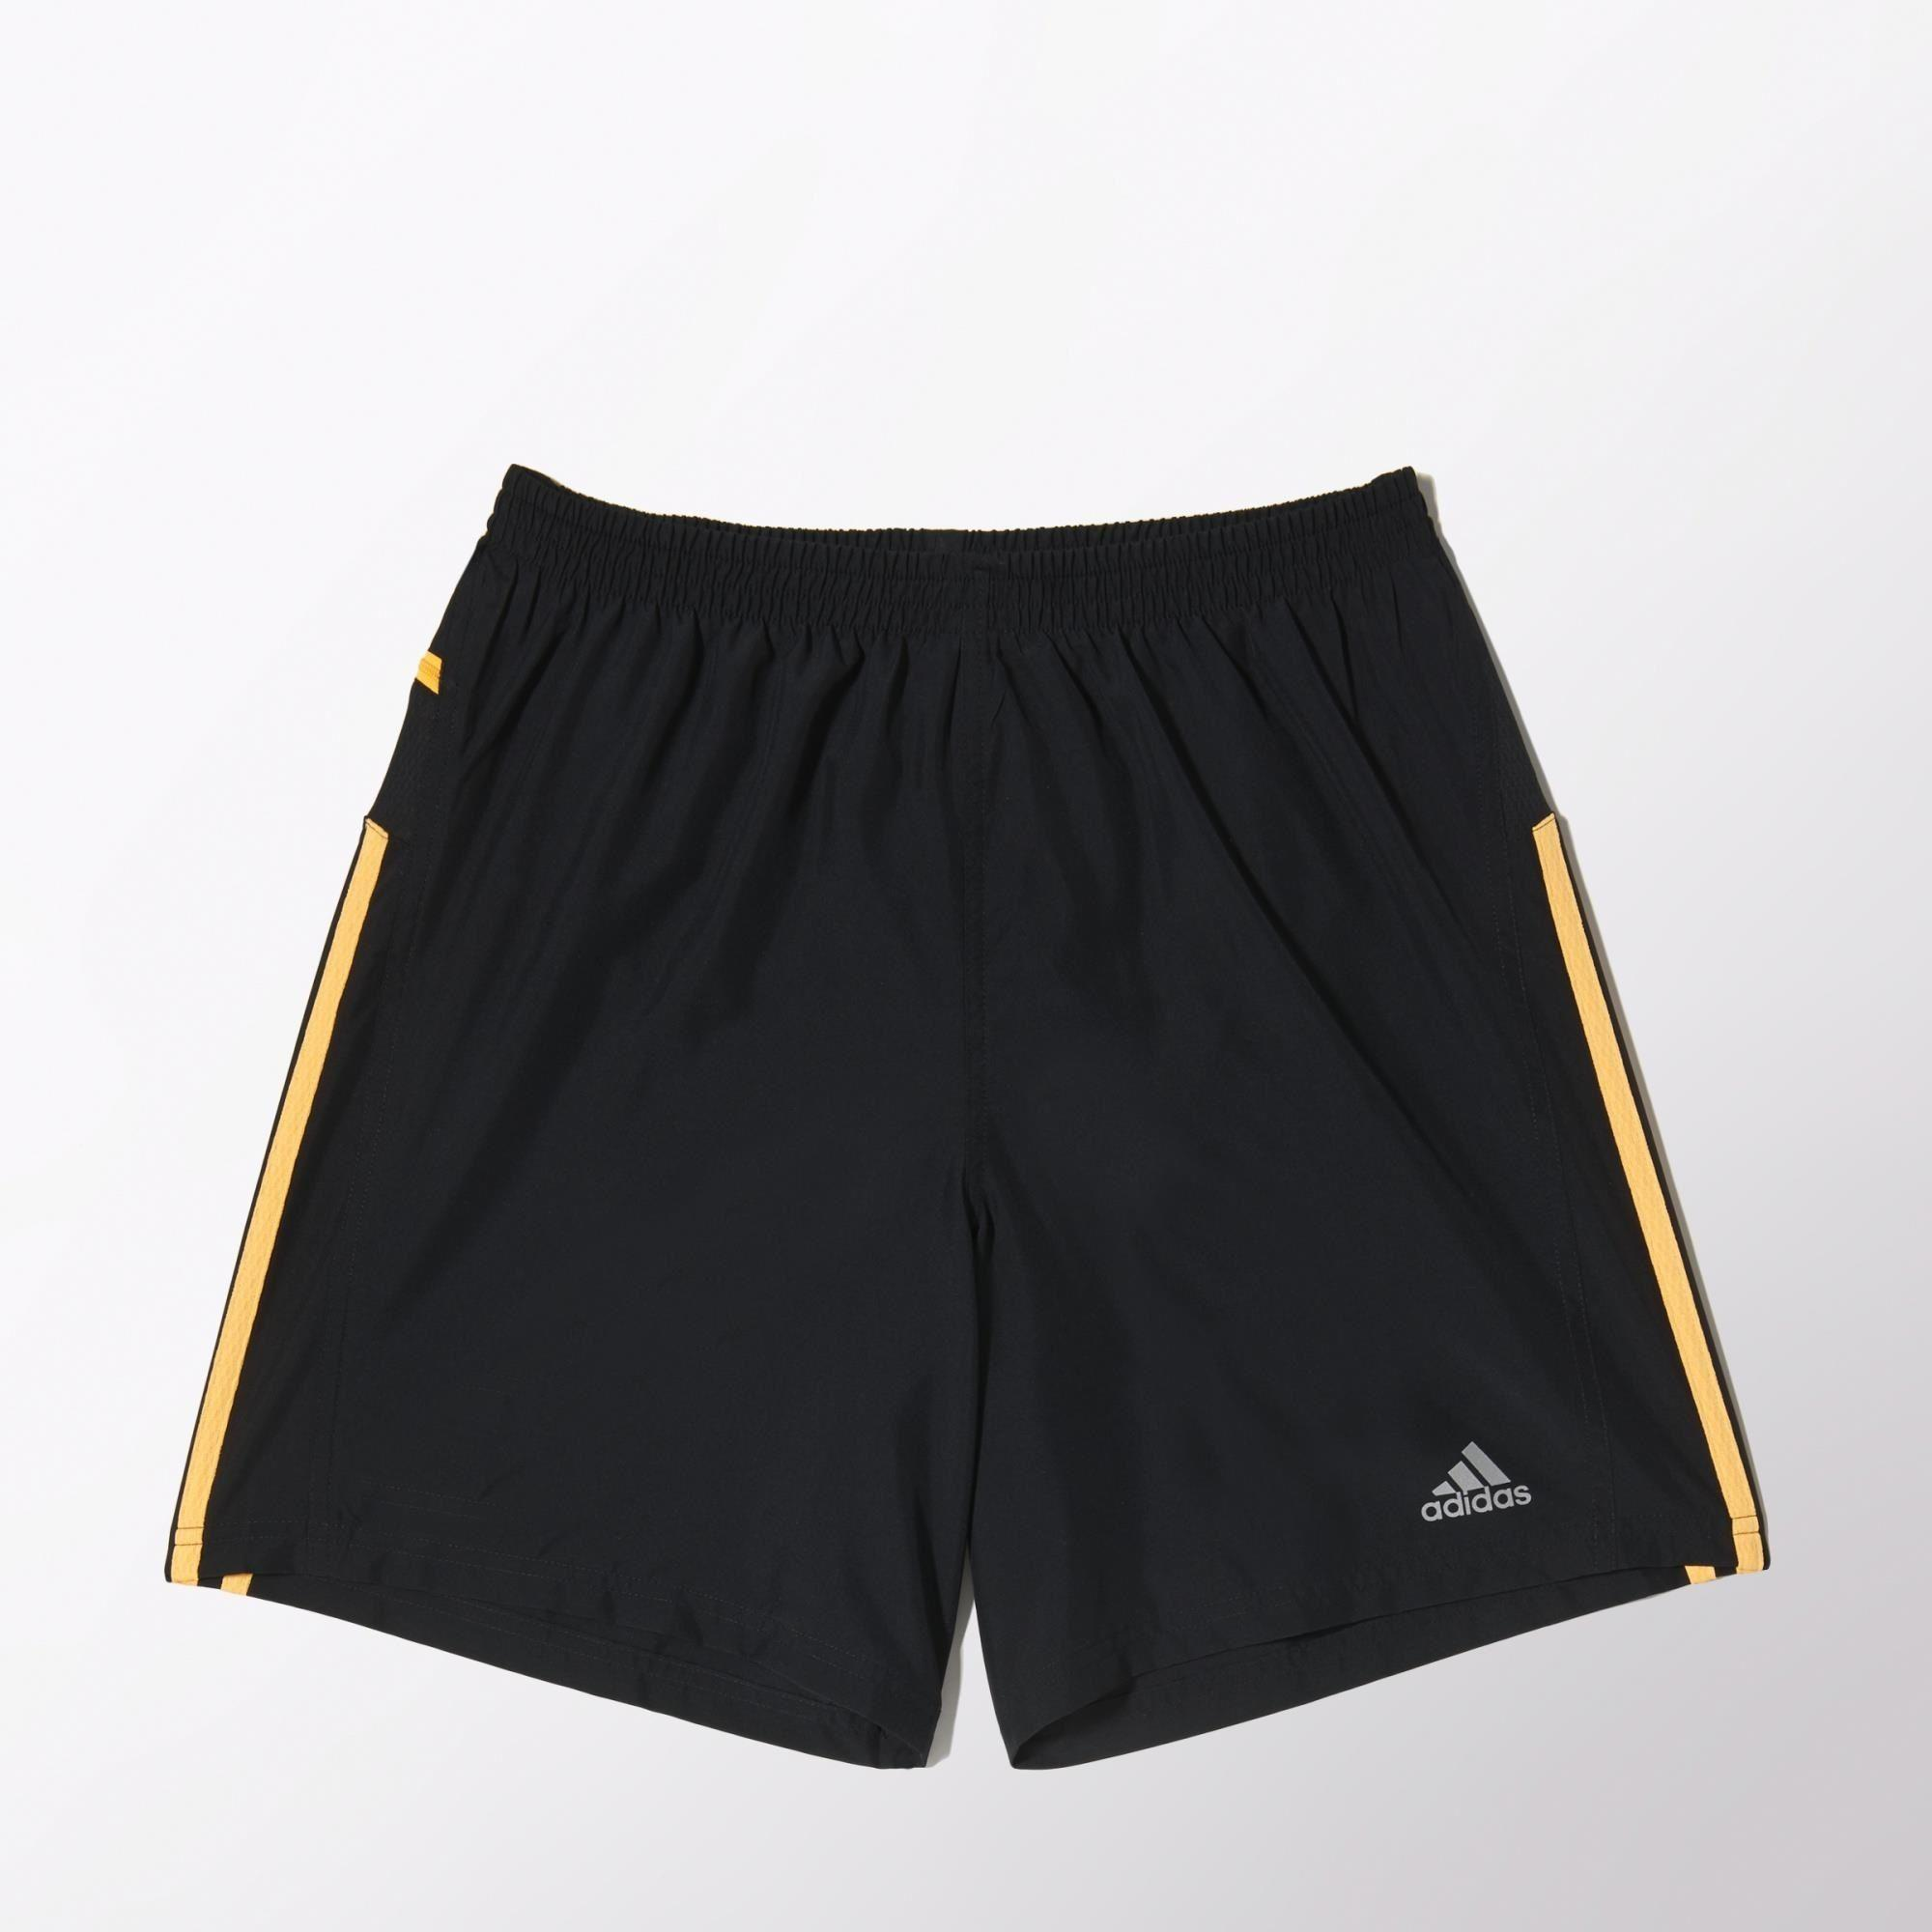 Adidas Response 7